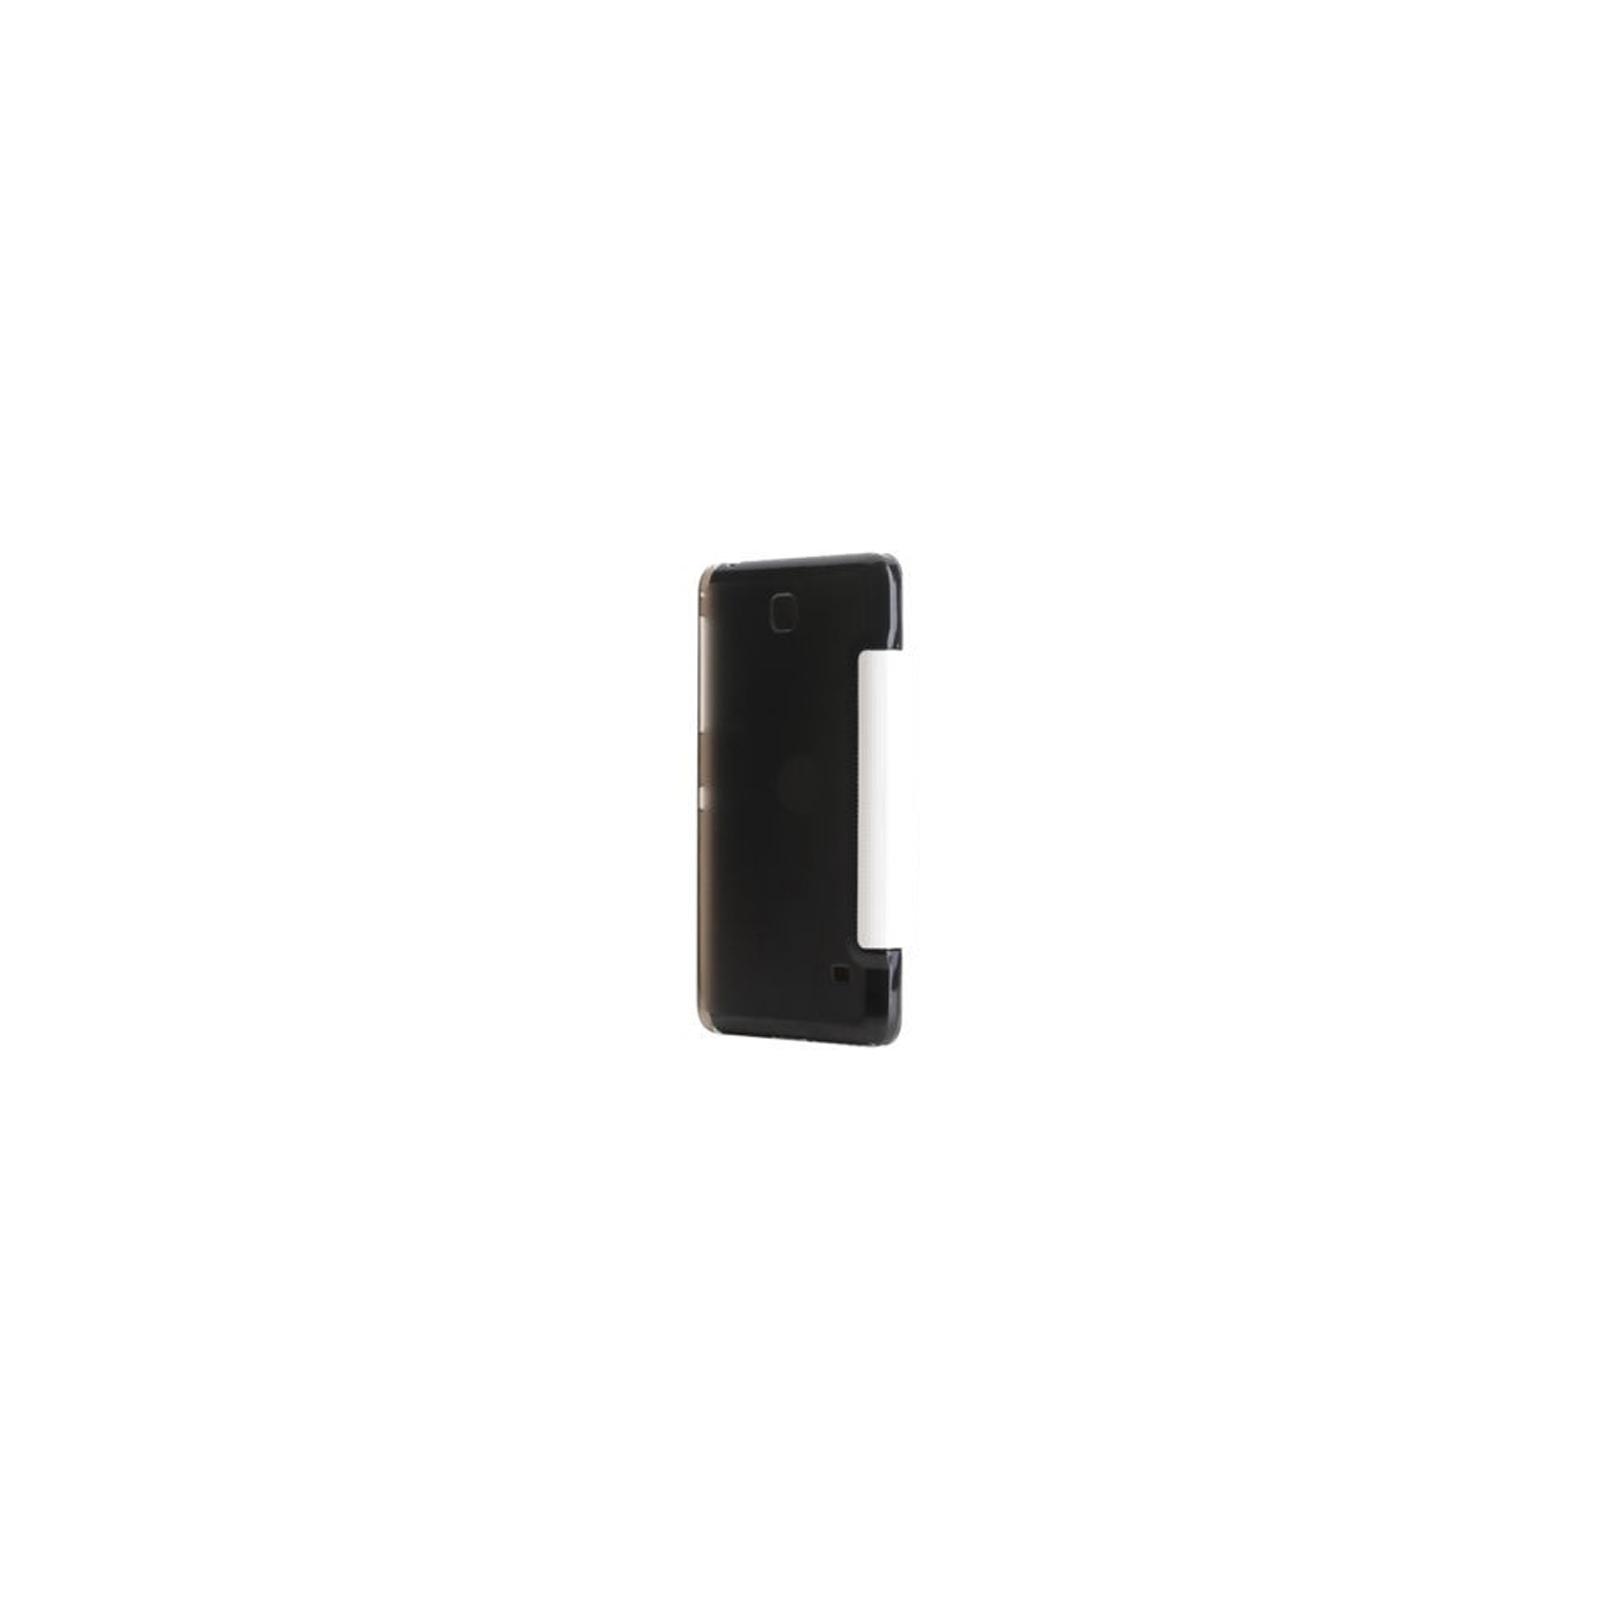 Чехол для планшета Rock Samsung Galaxy Tab 4 7.0 New elegant series white (Tab 4 7.0-65394) изображение 2